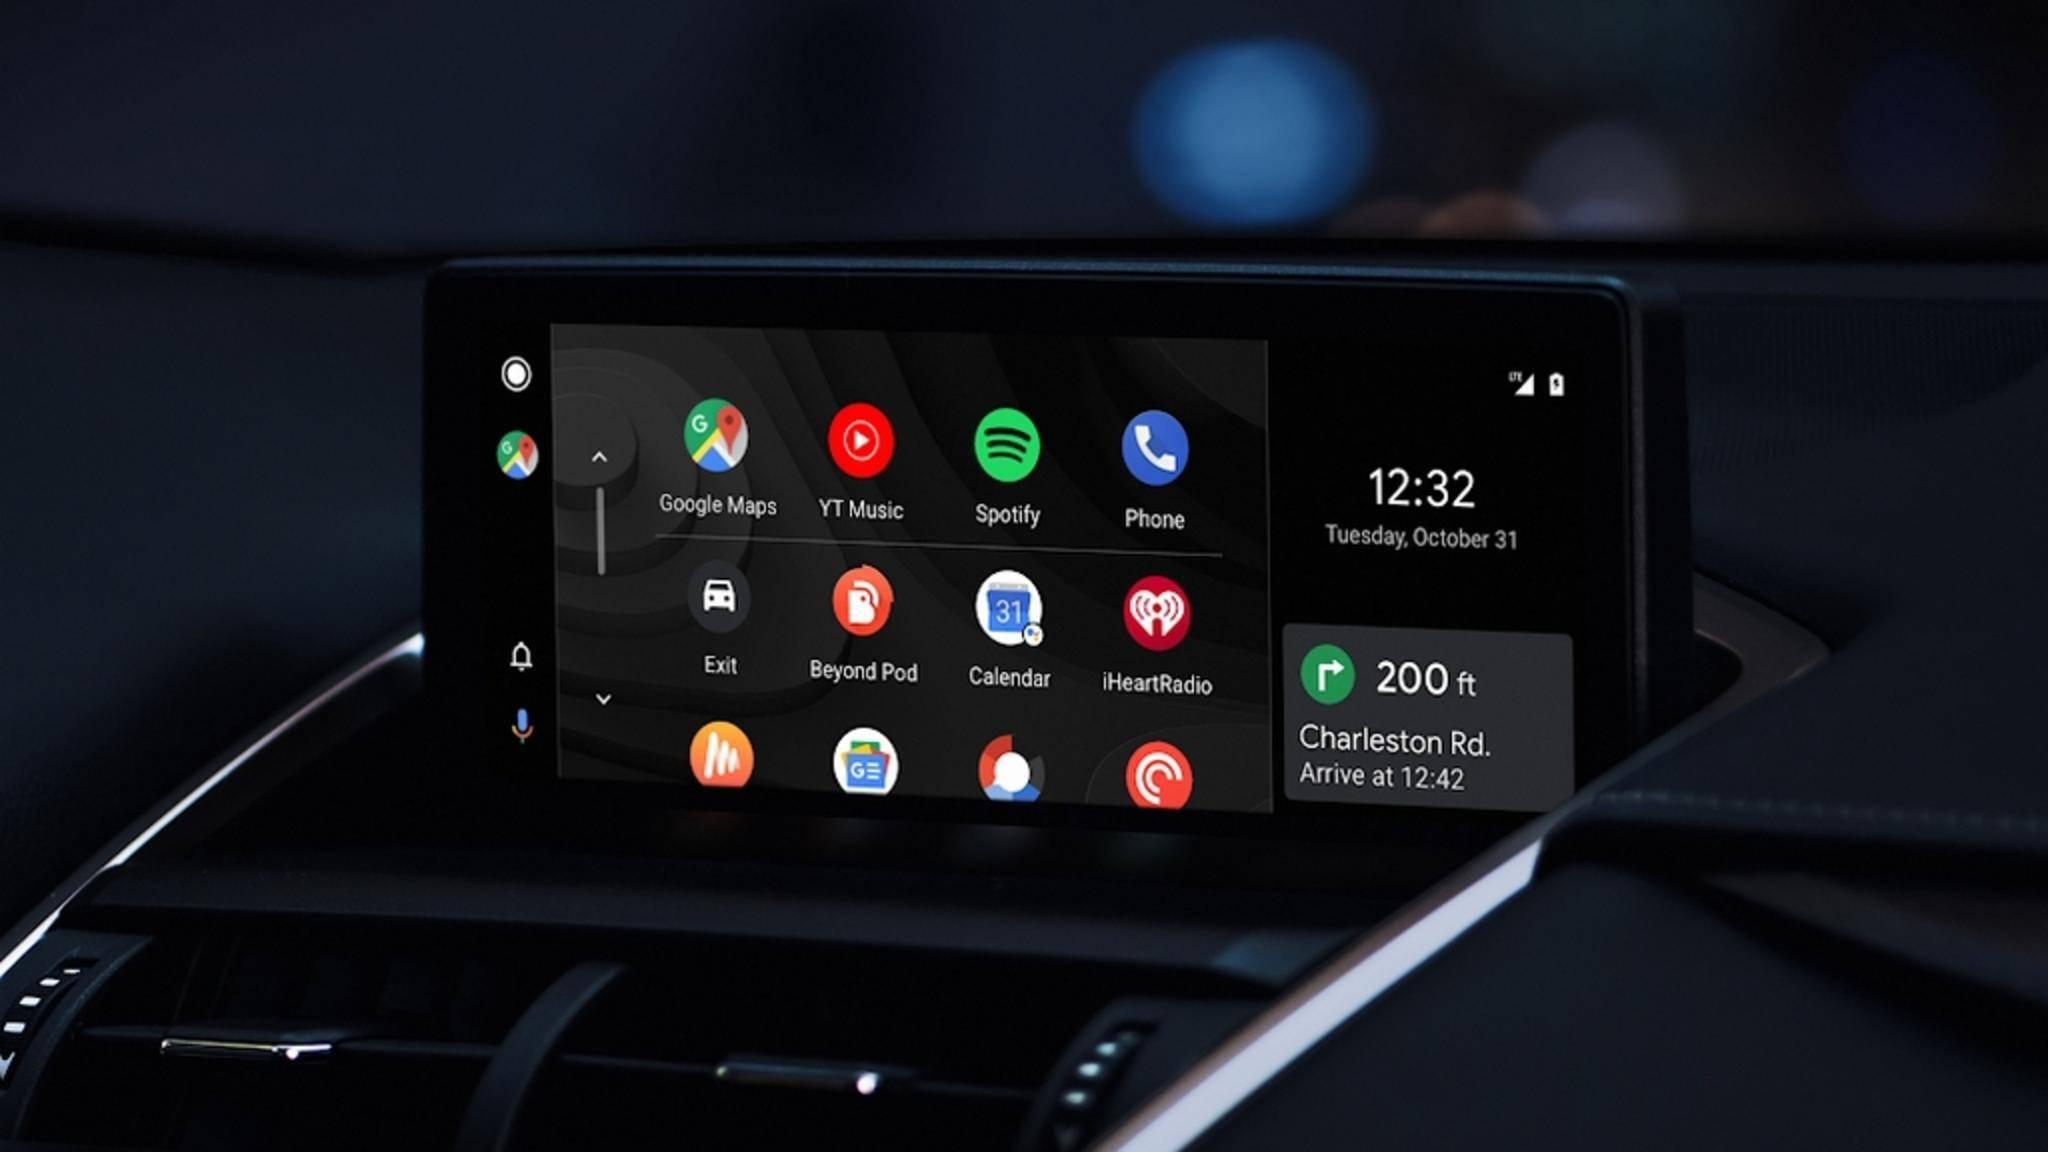 So sieht das neue Android Auto aus.